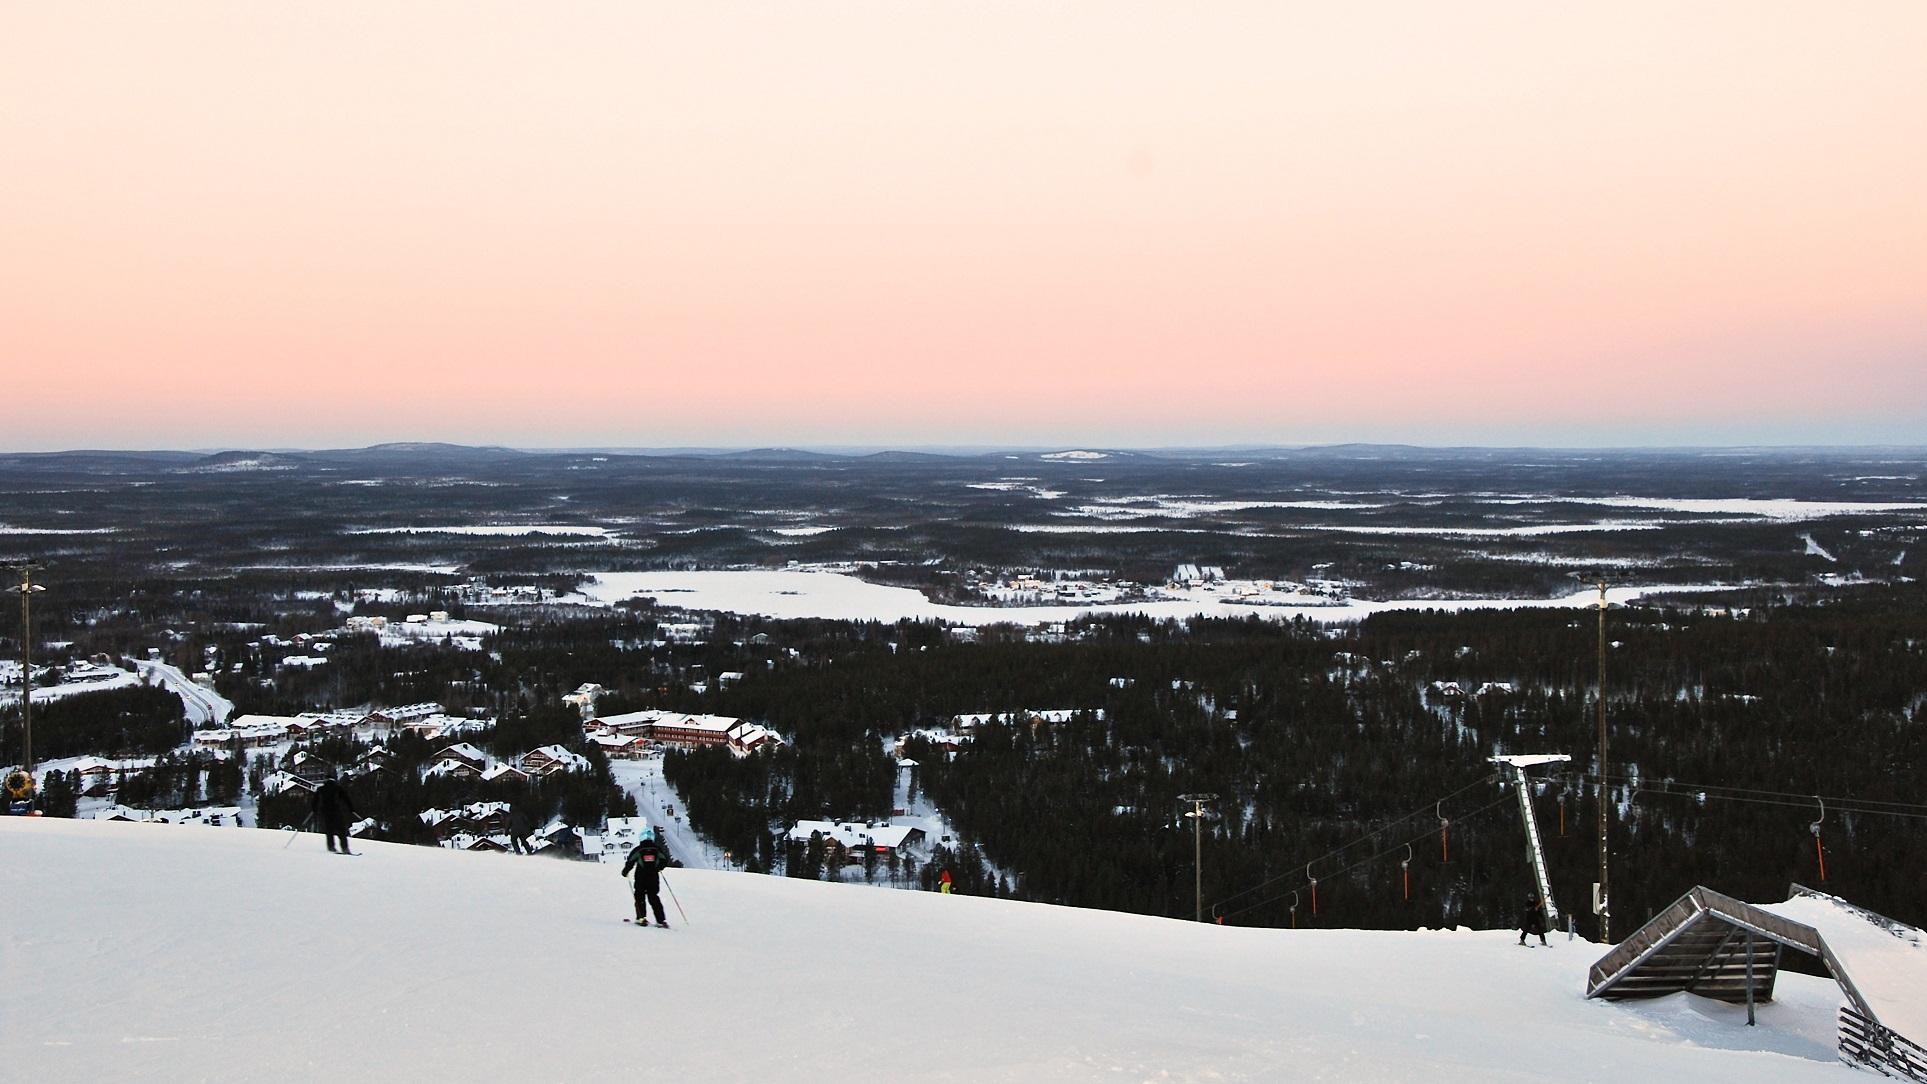 Lapland Ski Resort